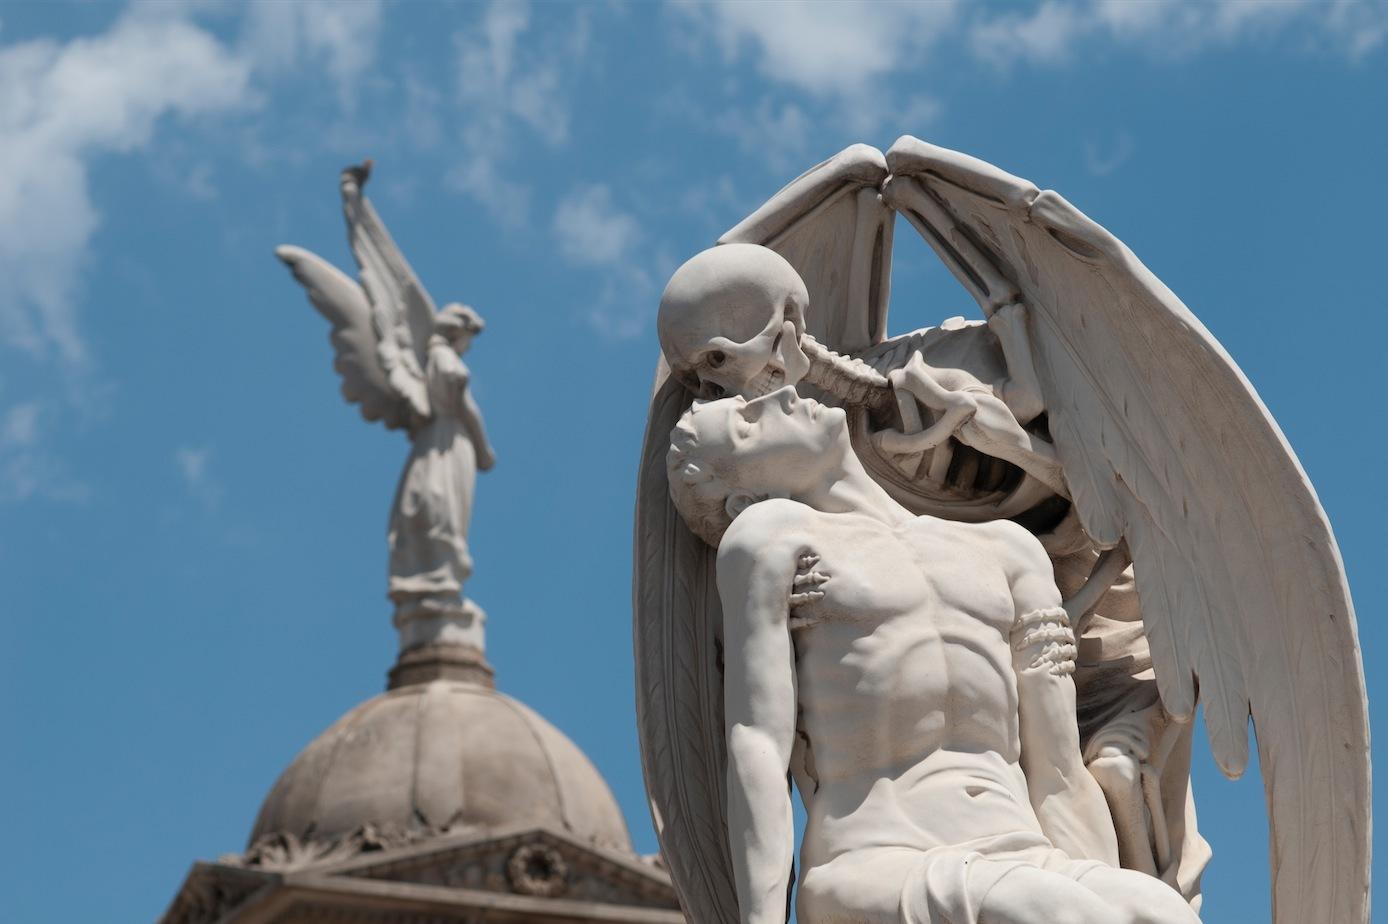 El petó de la mort, cementiri del Poblenou